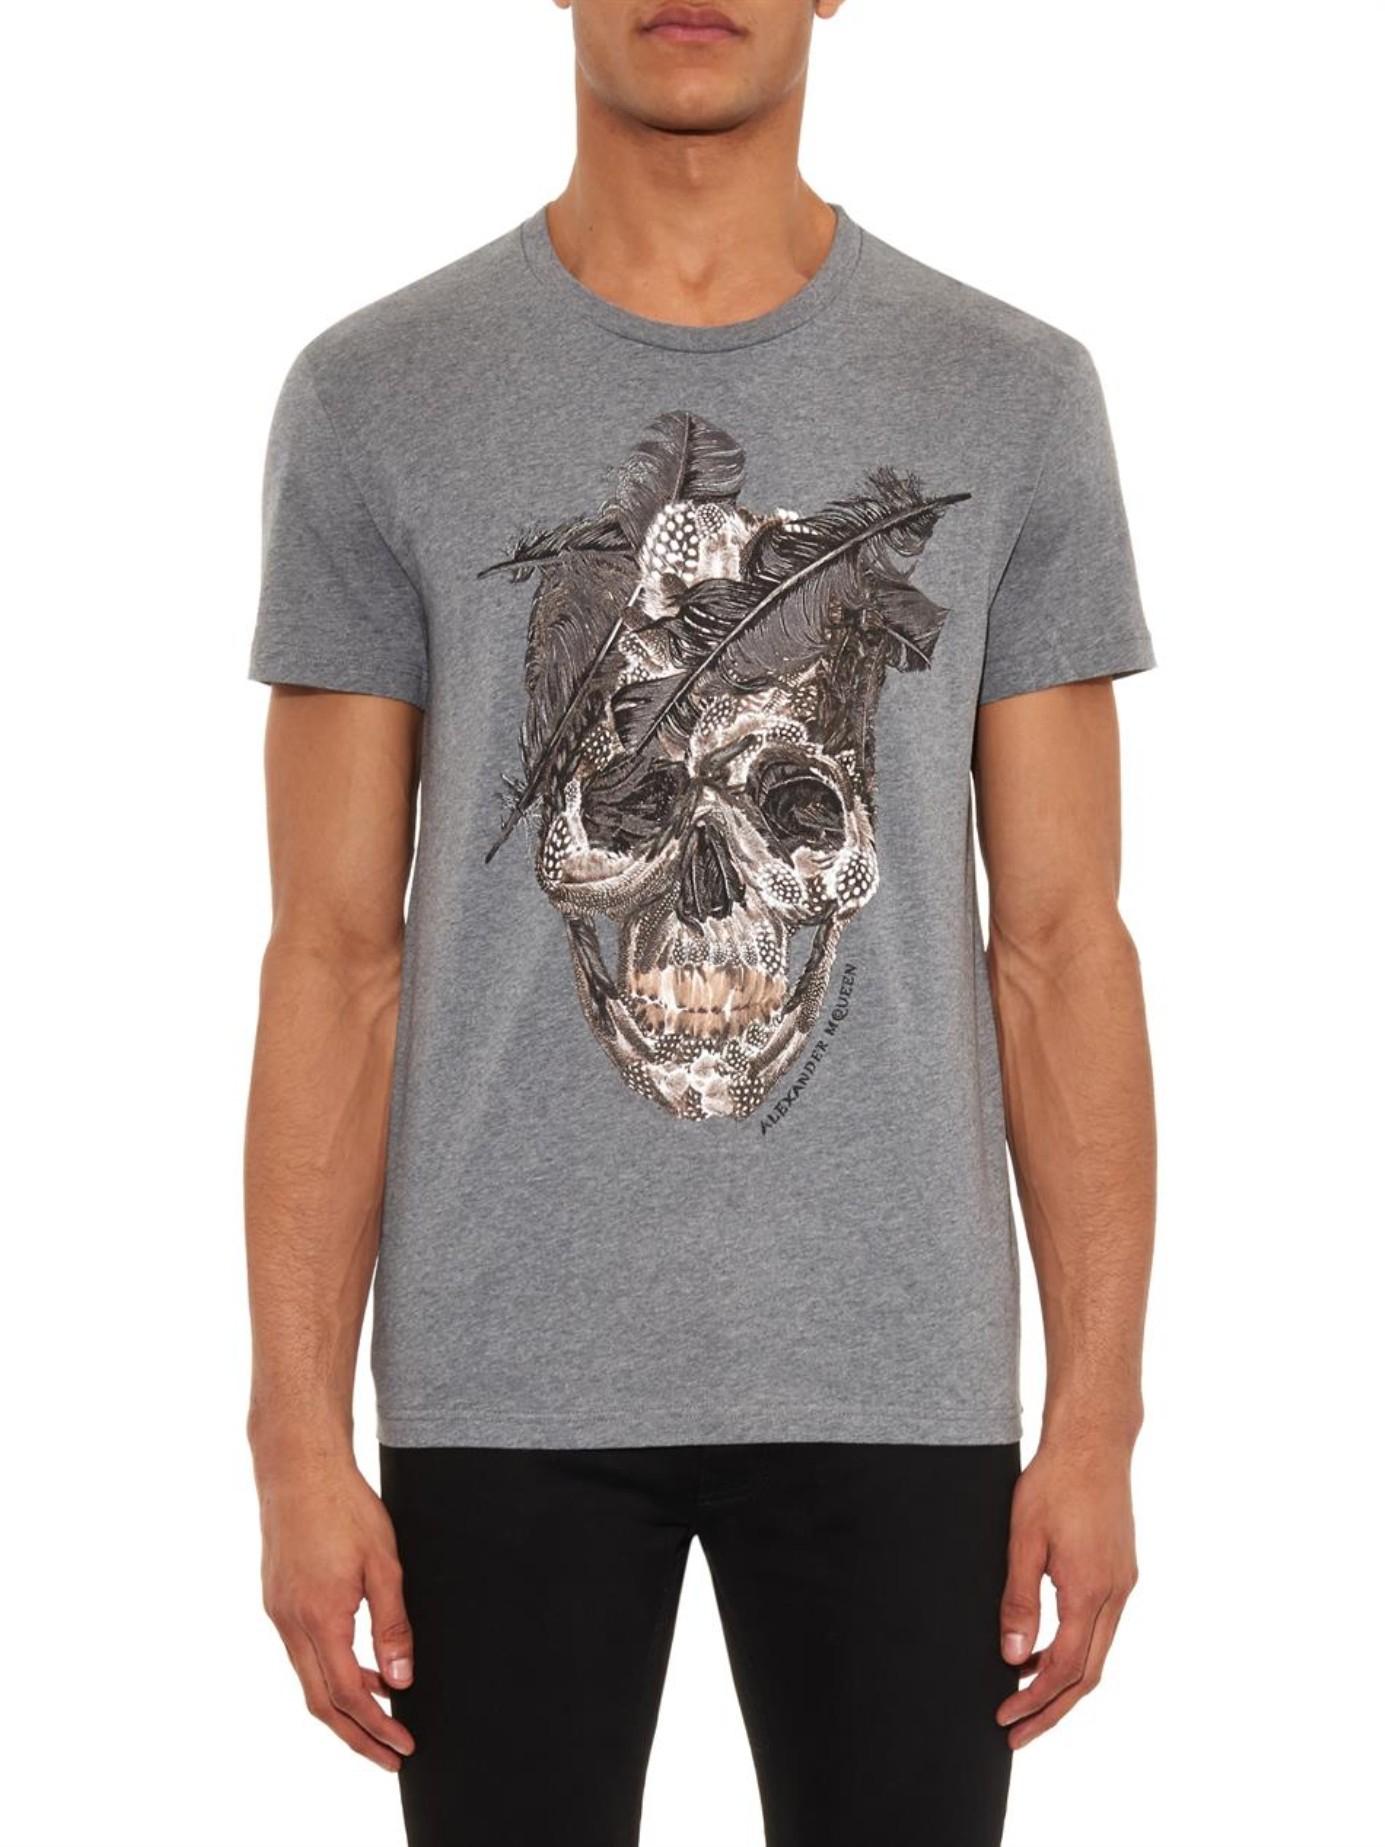 Alexander mcqueen skull print t shirt in gray for men lyst for Alexander mcqueen shirt men